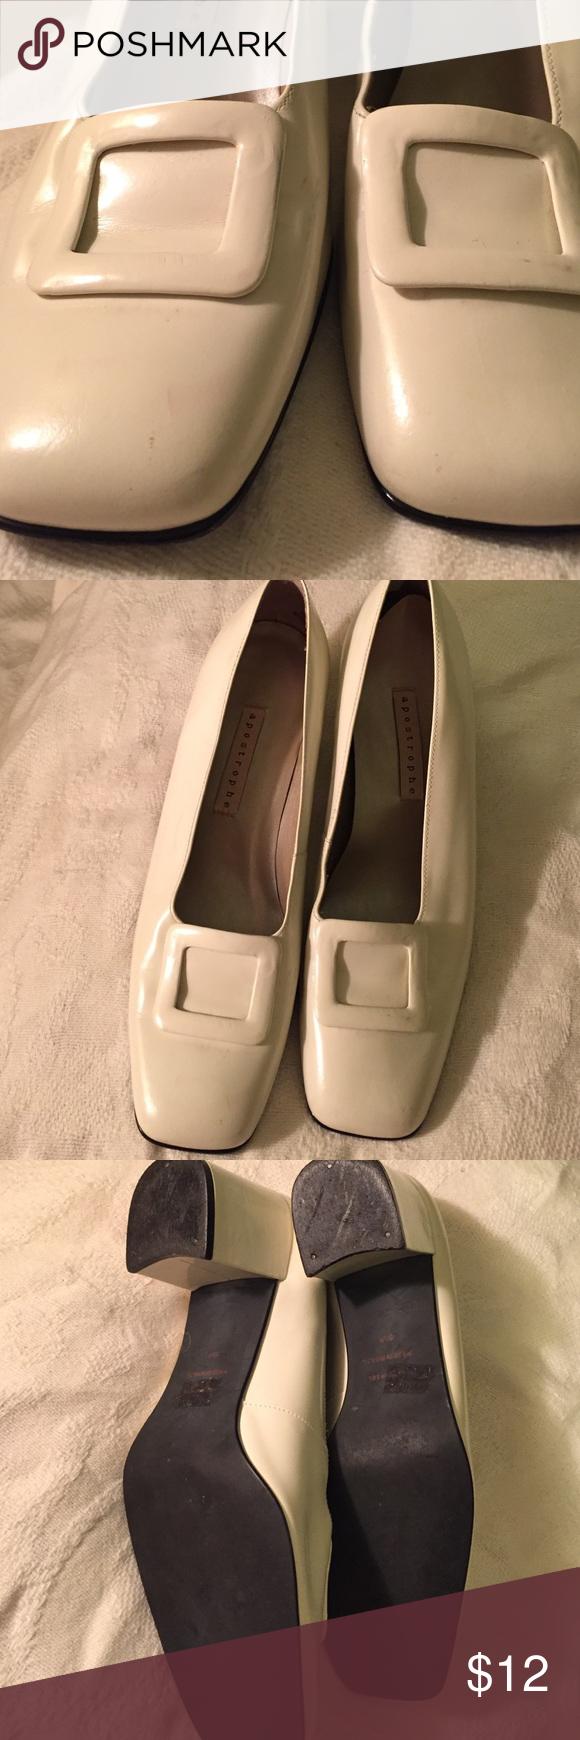 Aposthphe shoes color cream Shoes size 9/5color cream comfortable good condition Apostrophe Shoes Heels